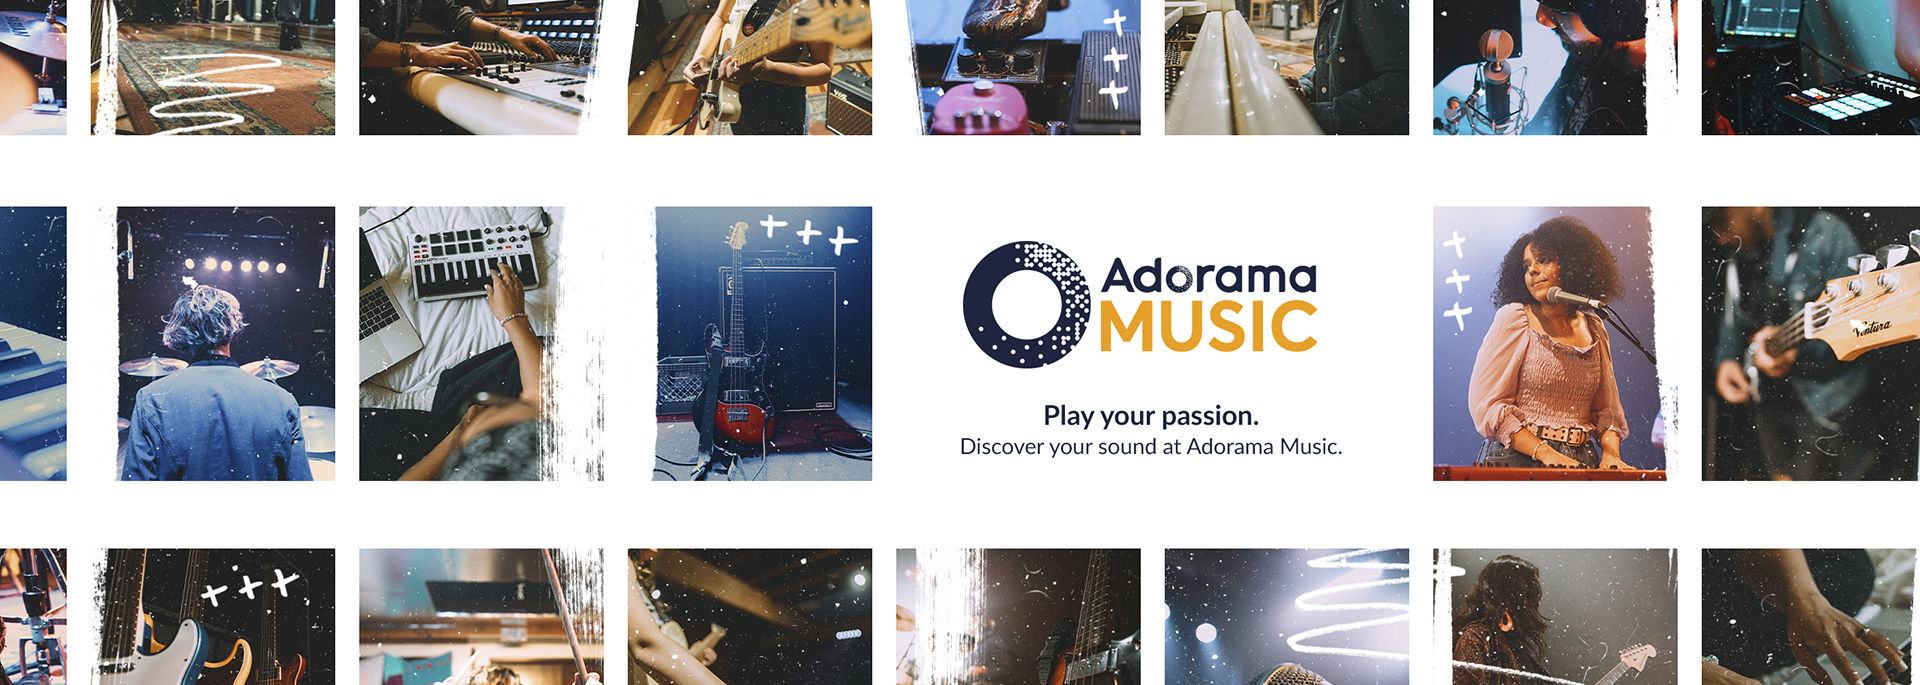 #ADORAMA channel